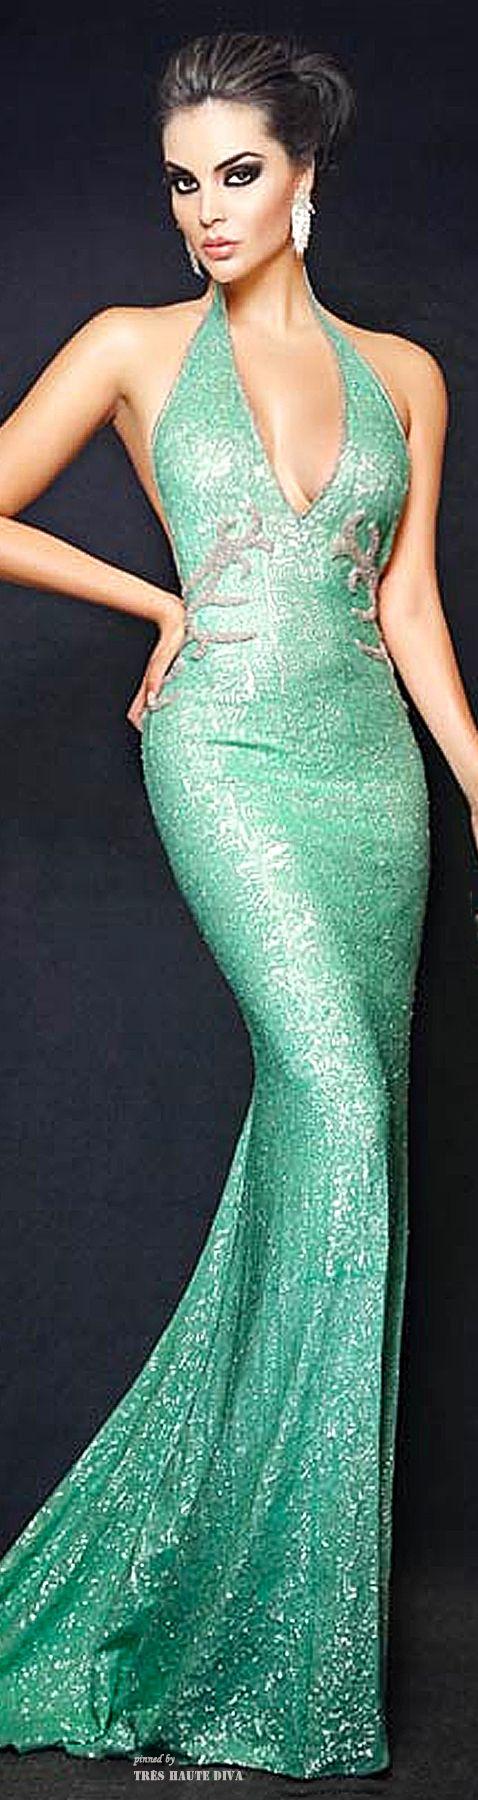 Sexy gown - http://www.inews-news.com/women-s-world.html